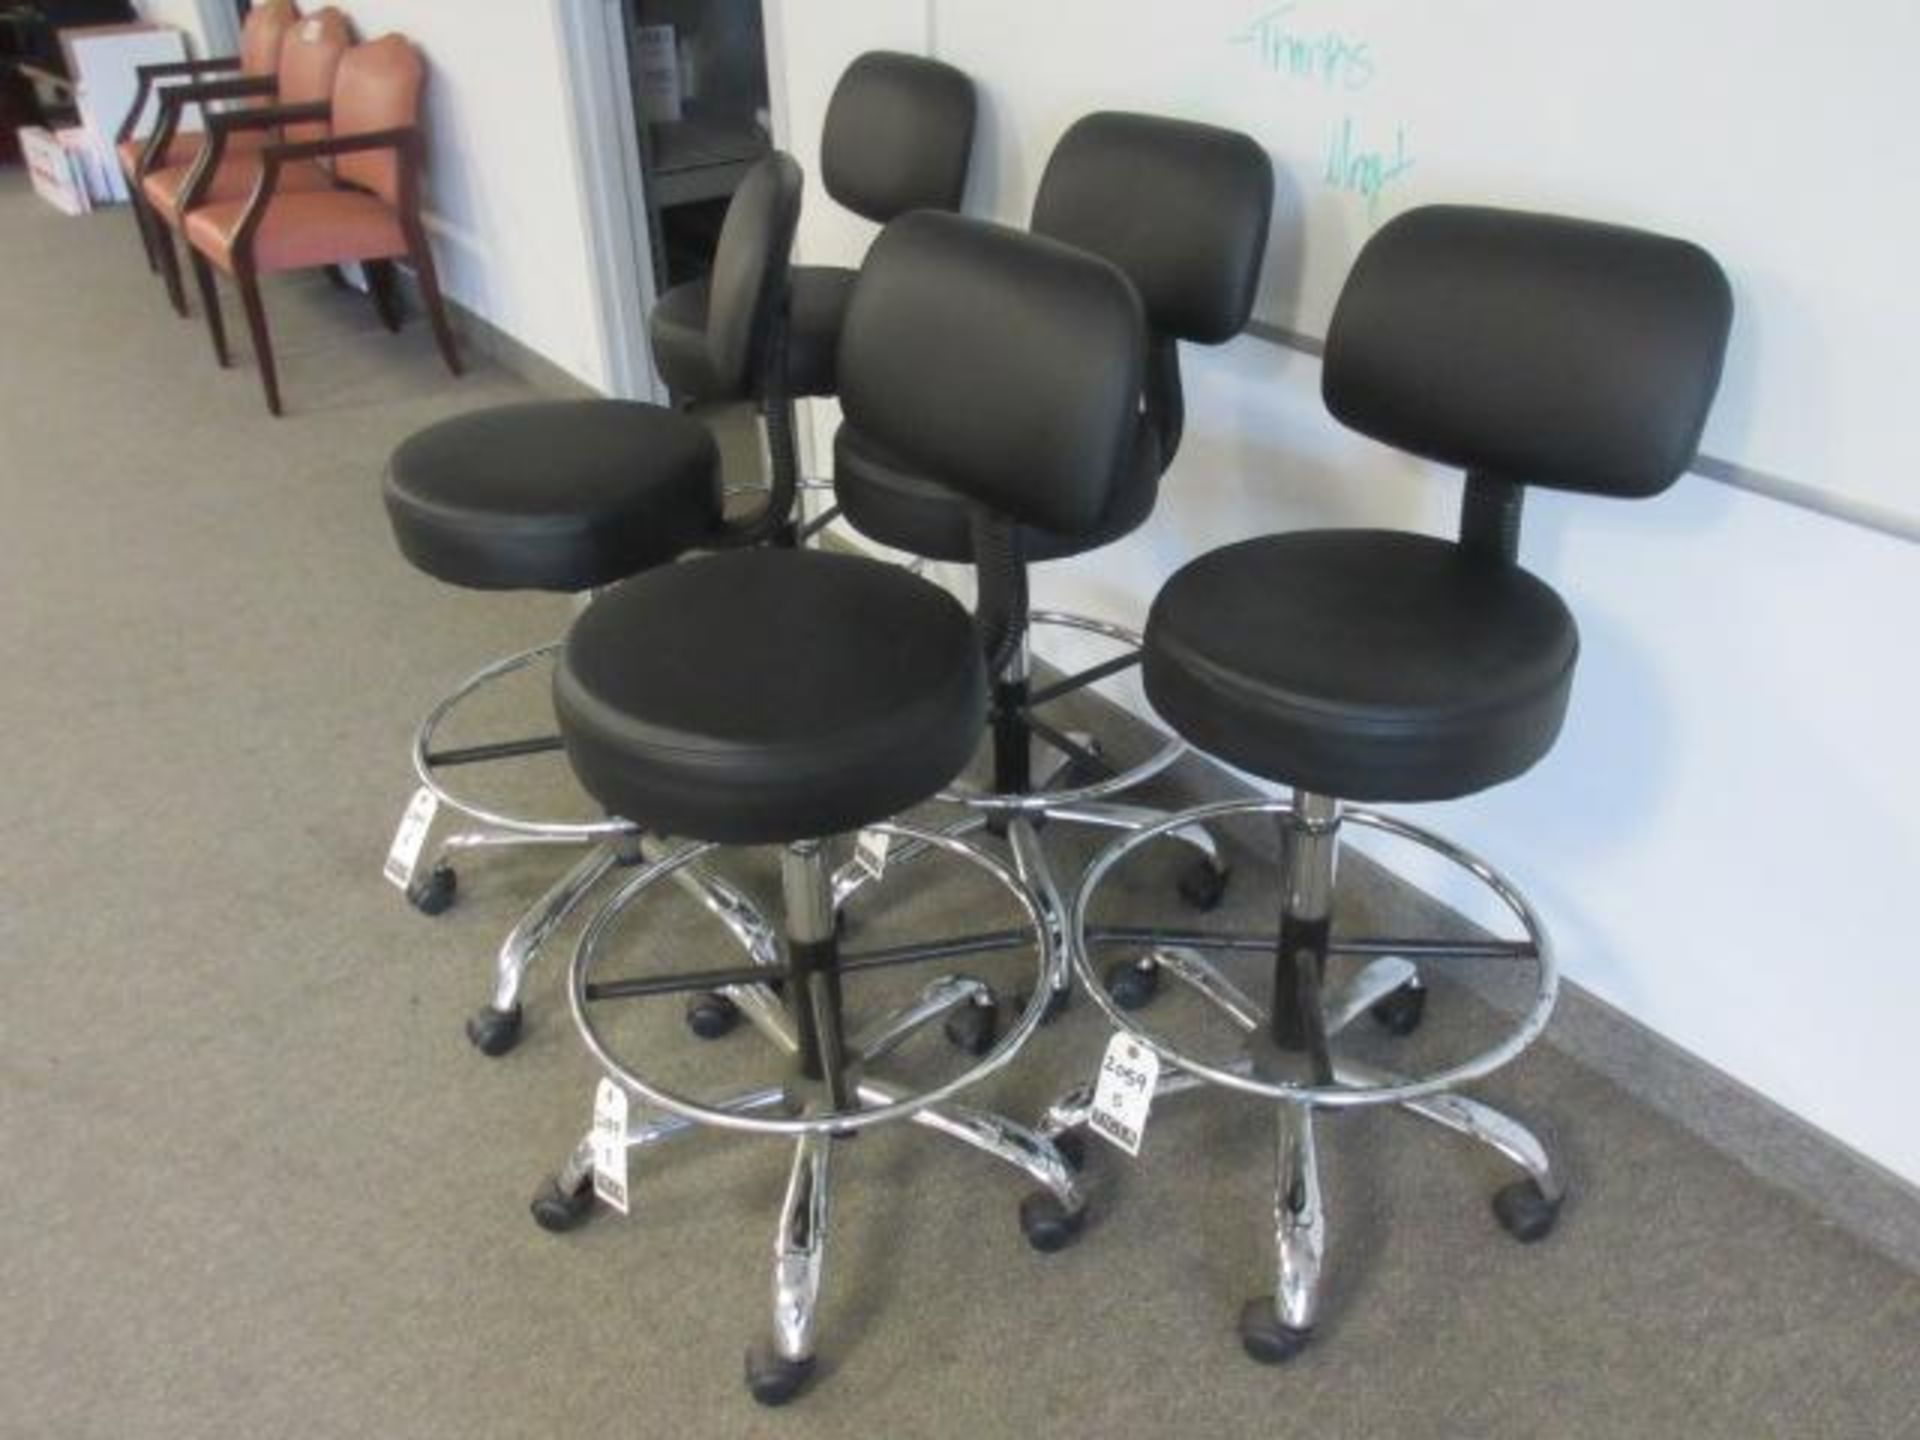 Black Lab Chairs-Swivel Base - Image 2 of 4